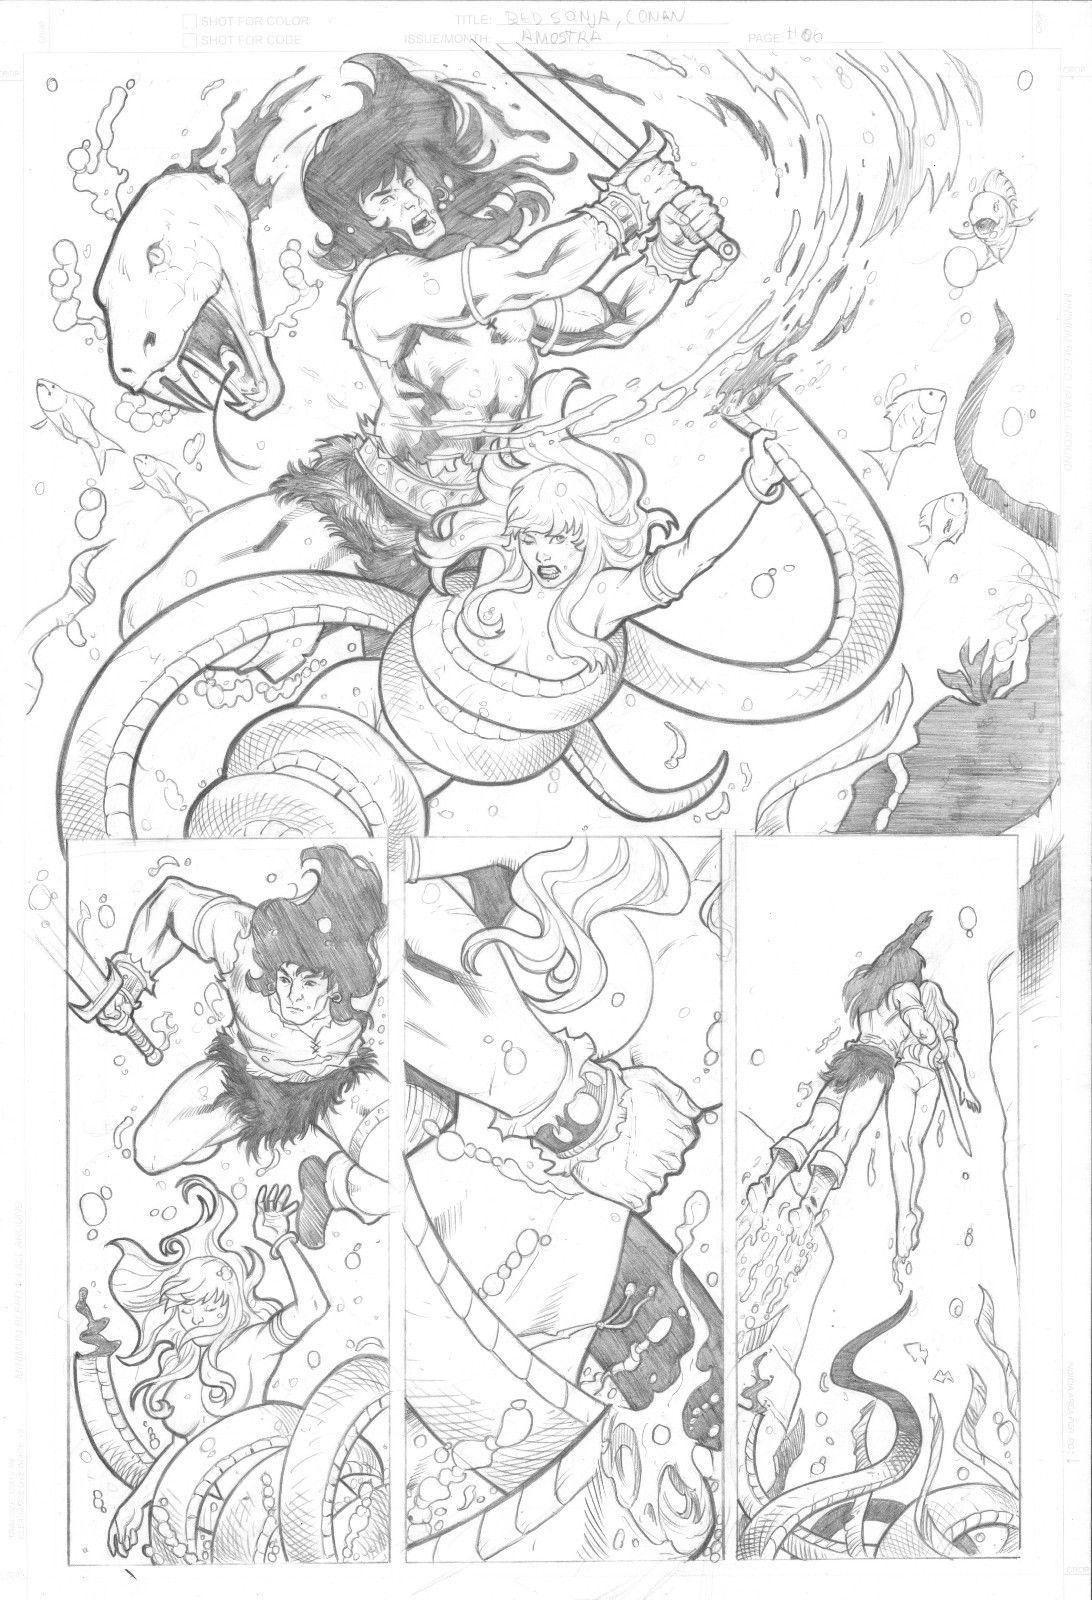 RED SONJA & CONAN TEST PAGE 06 - BEAUTIFUL ORIGINAL COMIC PAGE BY ED SILVA